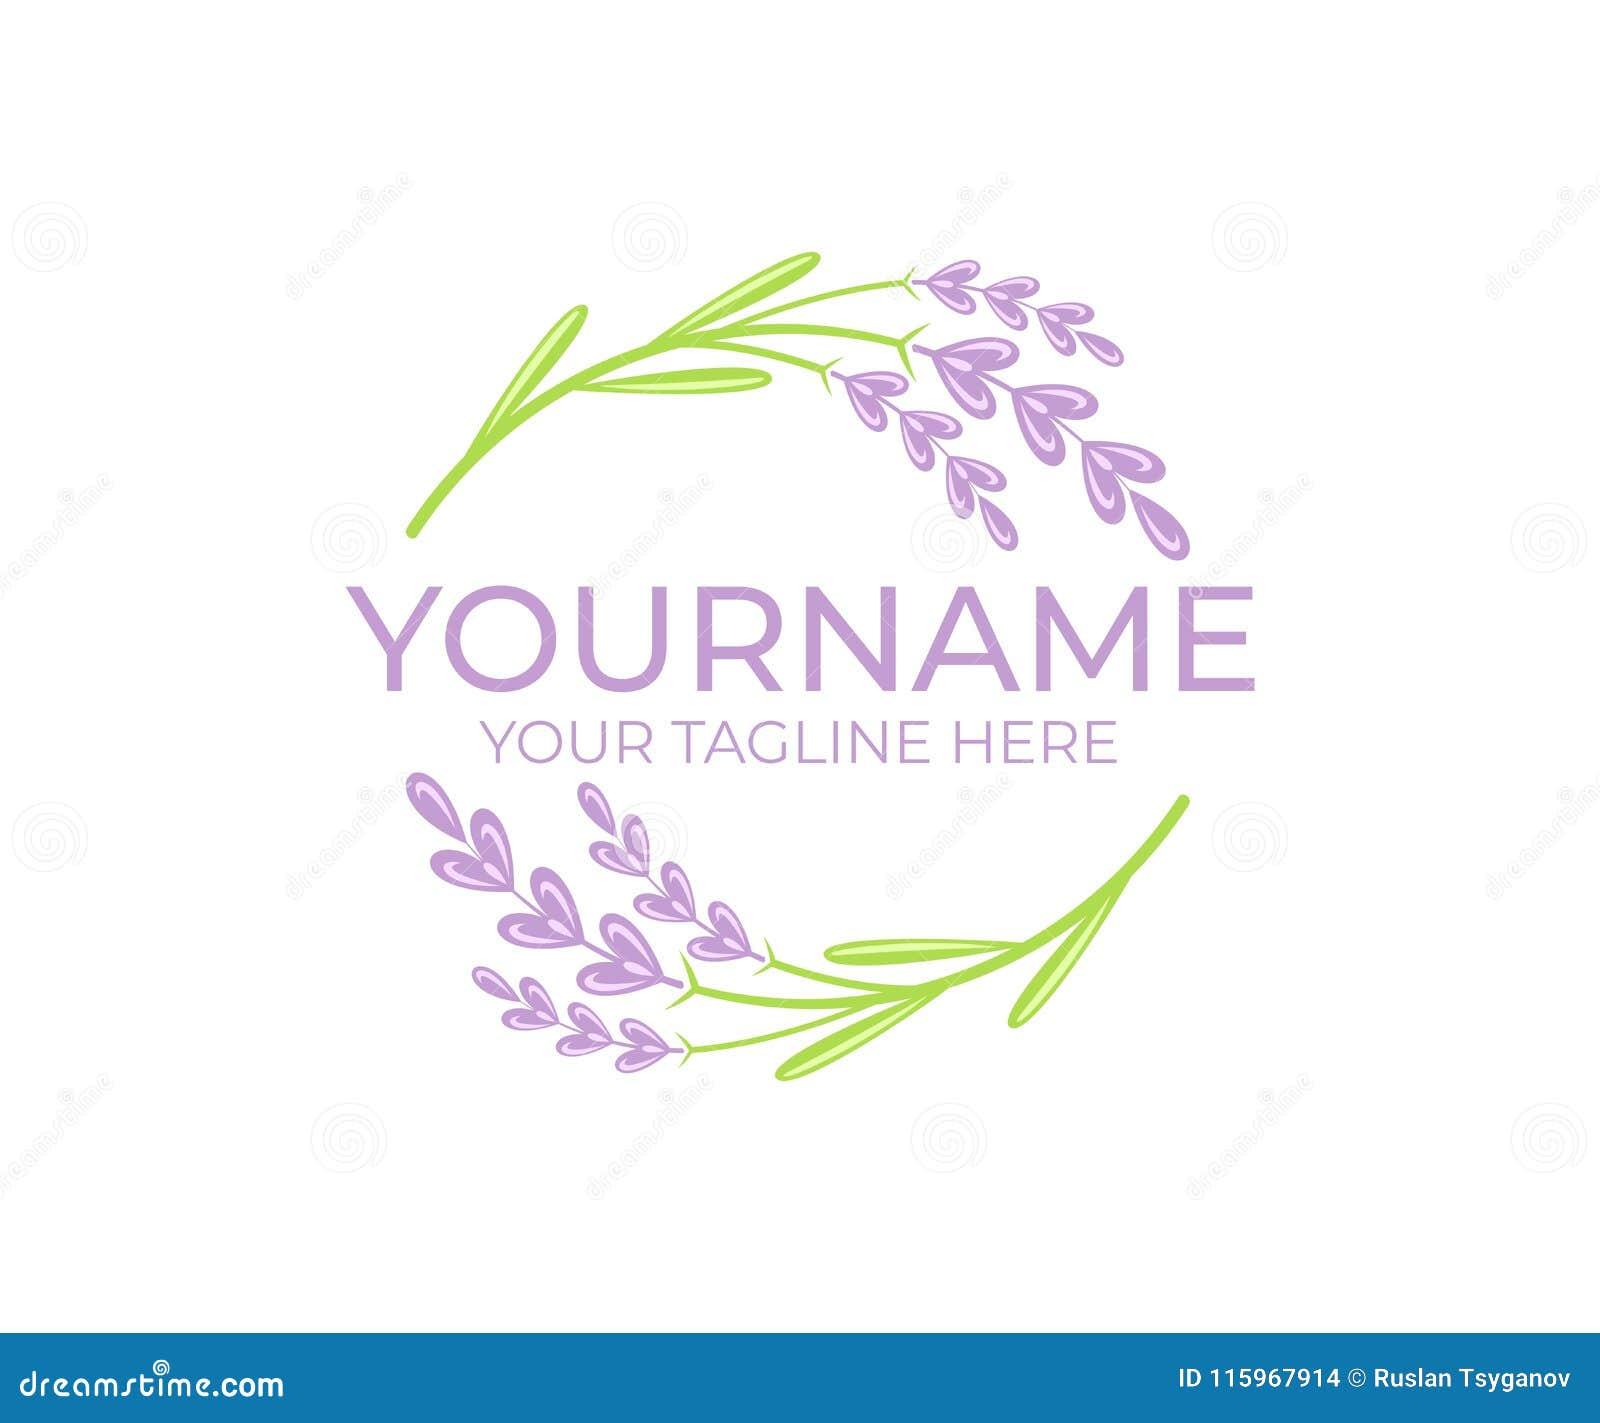 Lavender λουλούδι και εγκαταστάσεις, πρότυπο λογότυπων Ομορφιά και φυσικό καλλυντικό πετρέλαιο, κυκλικό vectorial σχέδιο